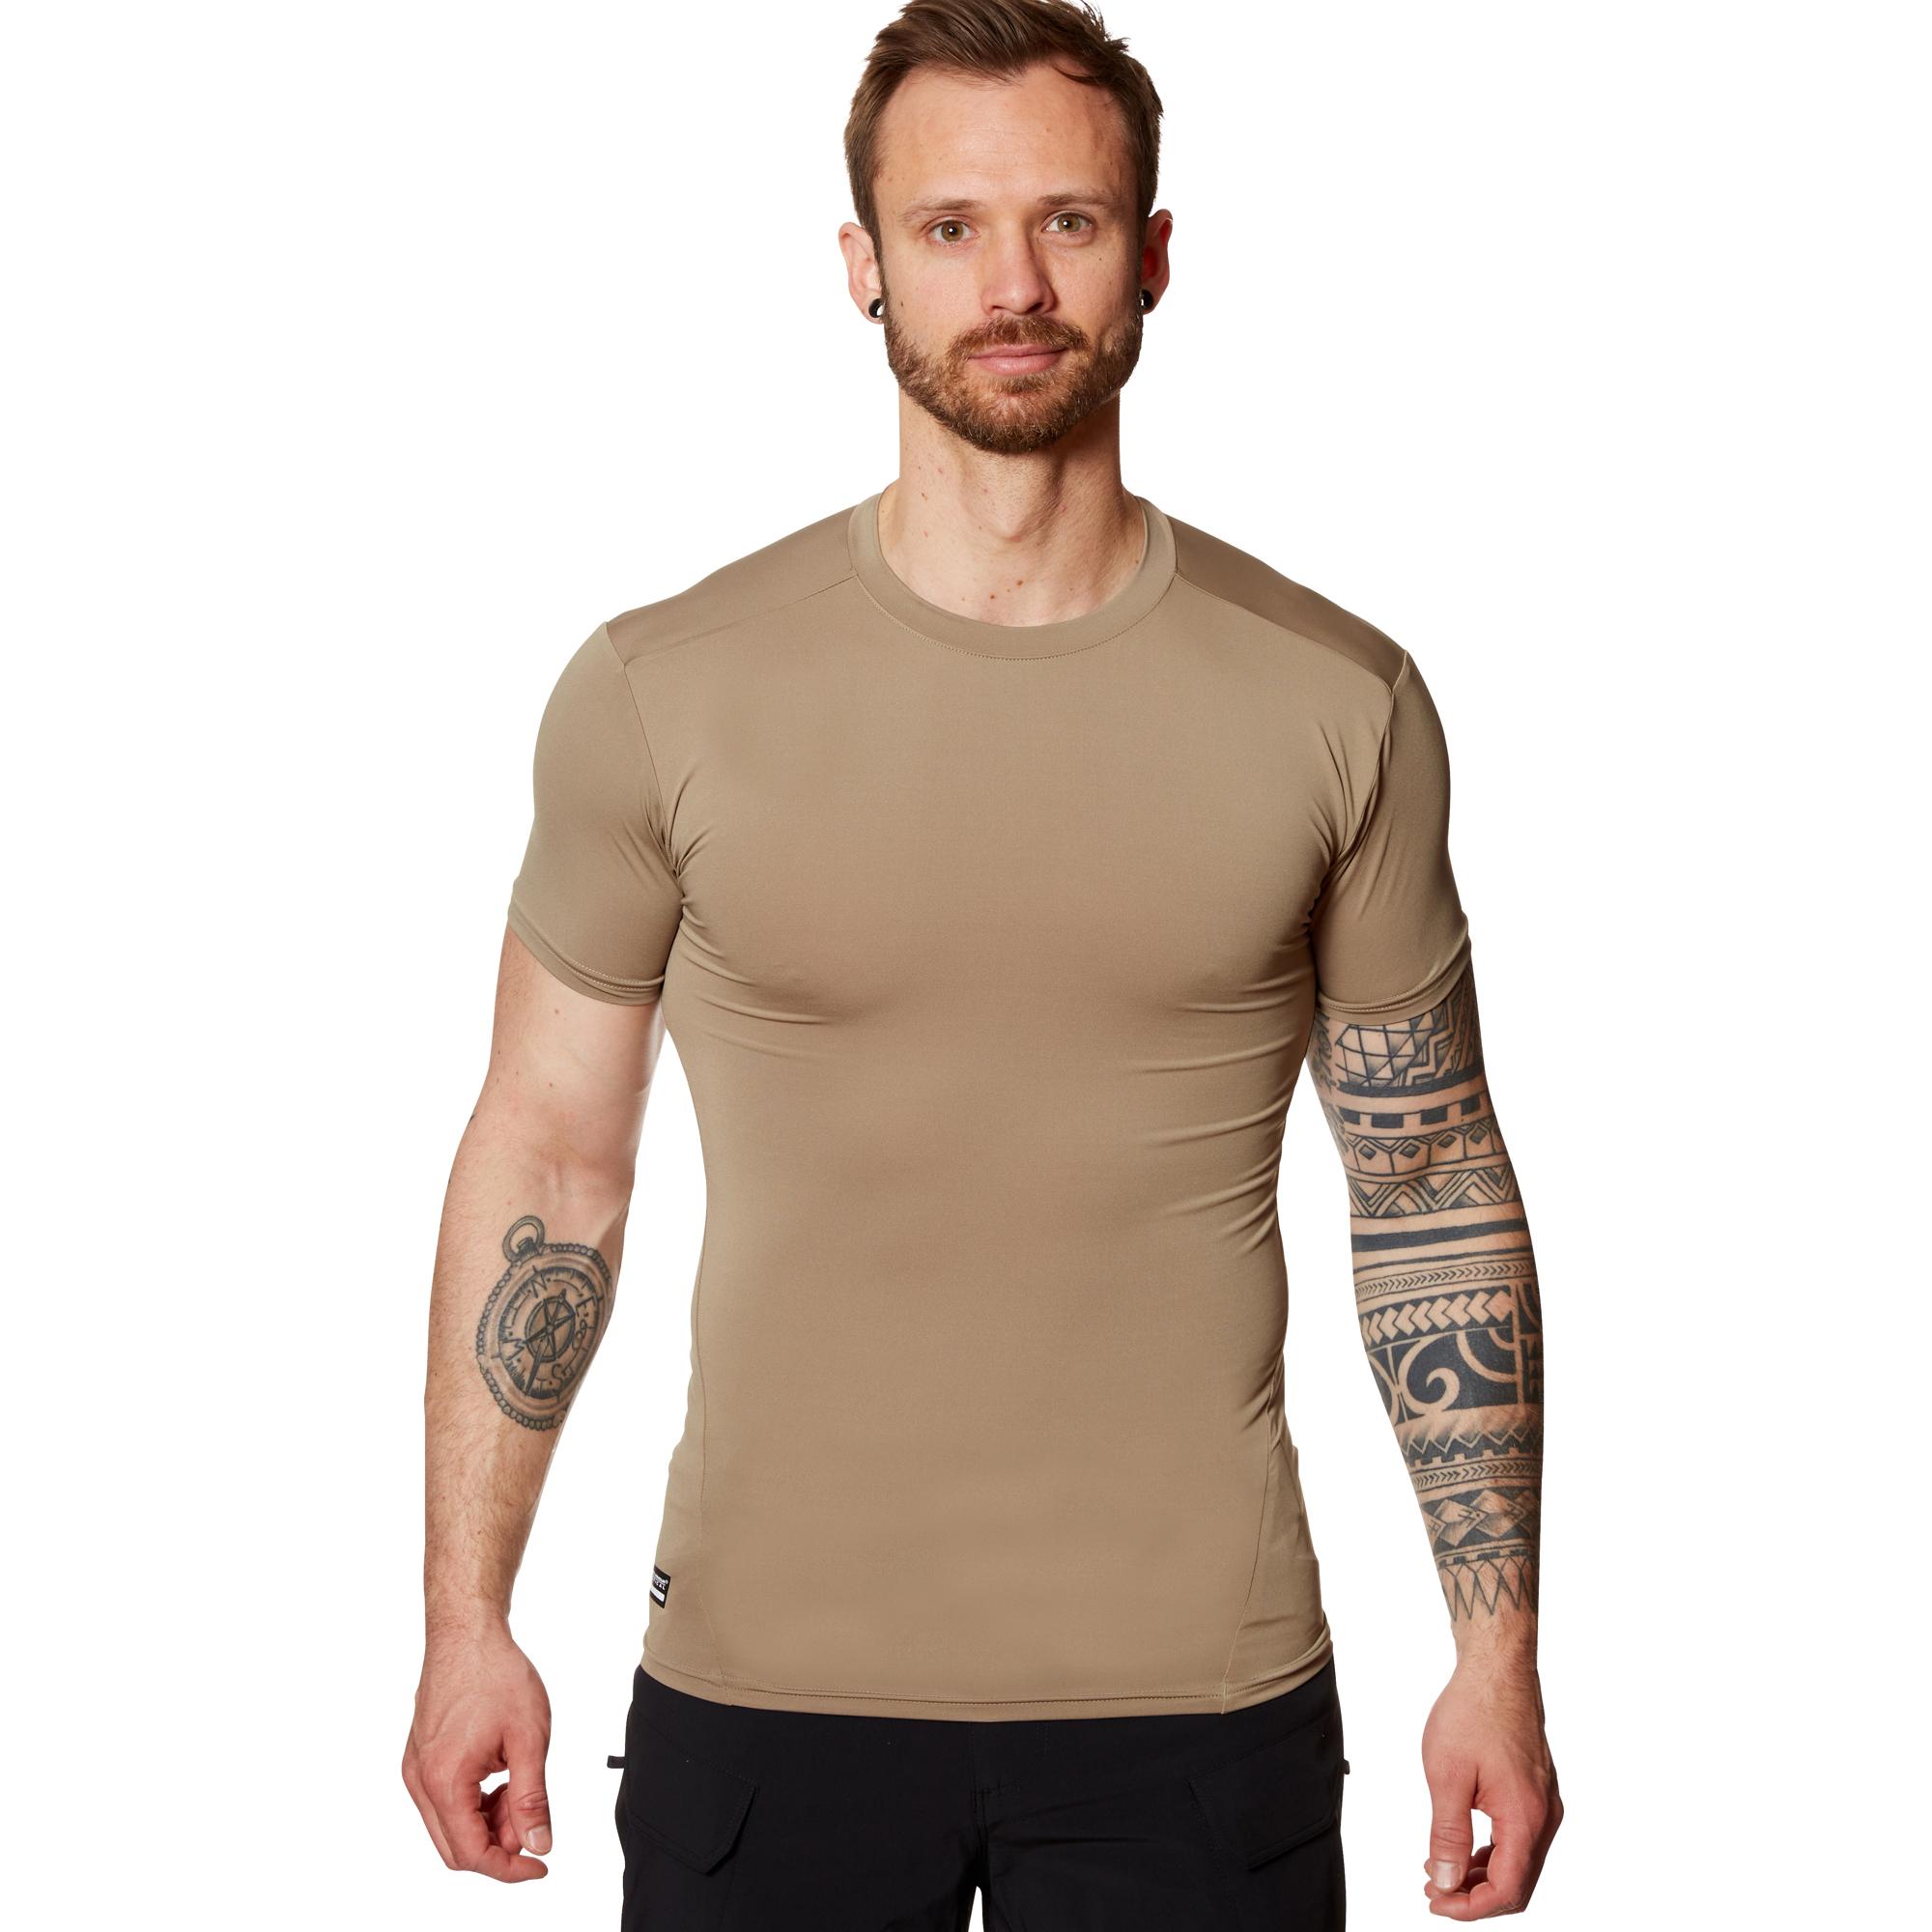 libertad gastar Ostentoso  Camiseta de compresión Under Armour Tactical HeatGear v. oliva